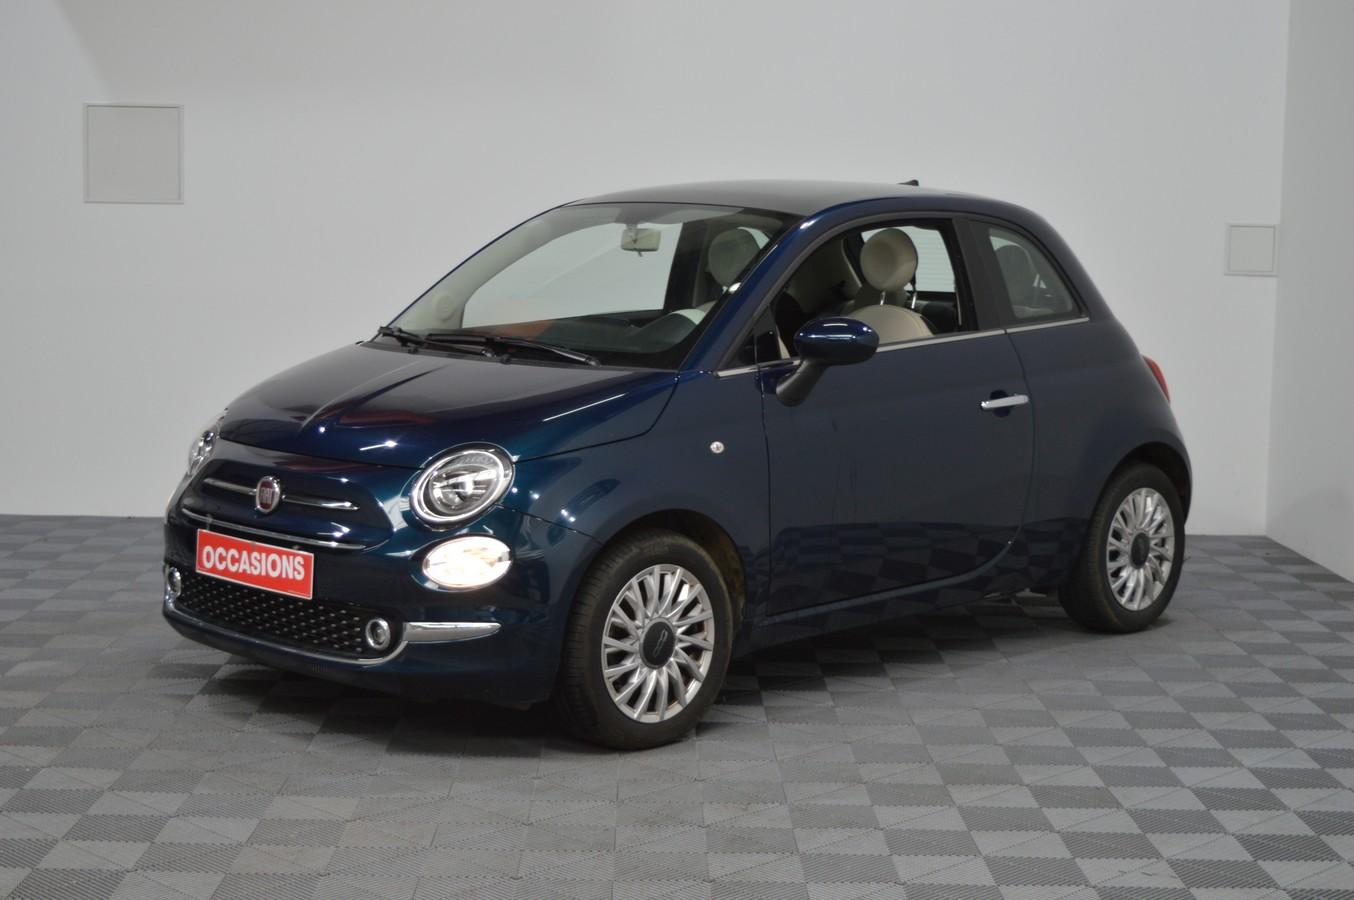 FIAT 500 SERIE 6 EURO 6D LOUNGE 1.2 69CH d'occasion